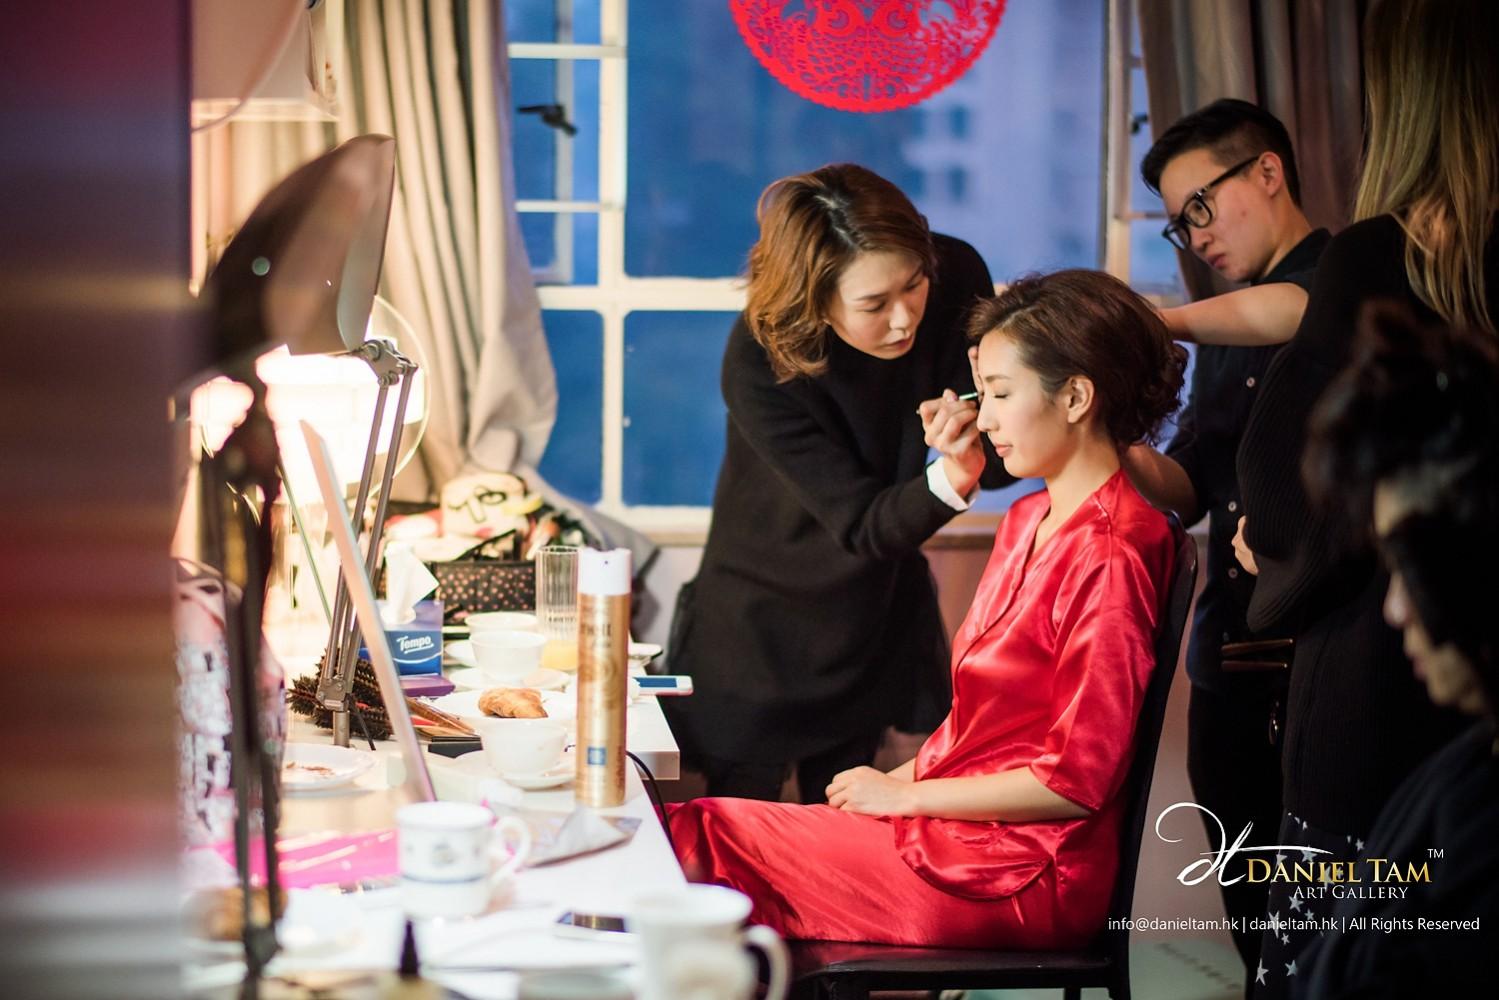 wedding-day-photography-hk-four-seasons-jessica-erik-01wedding-day-photography-hk-four-seasons-jessica-erik-01